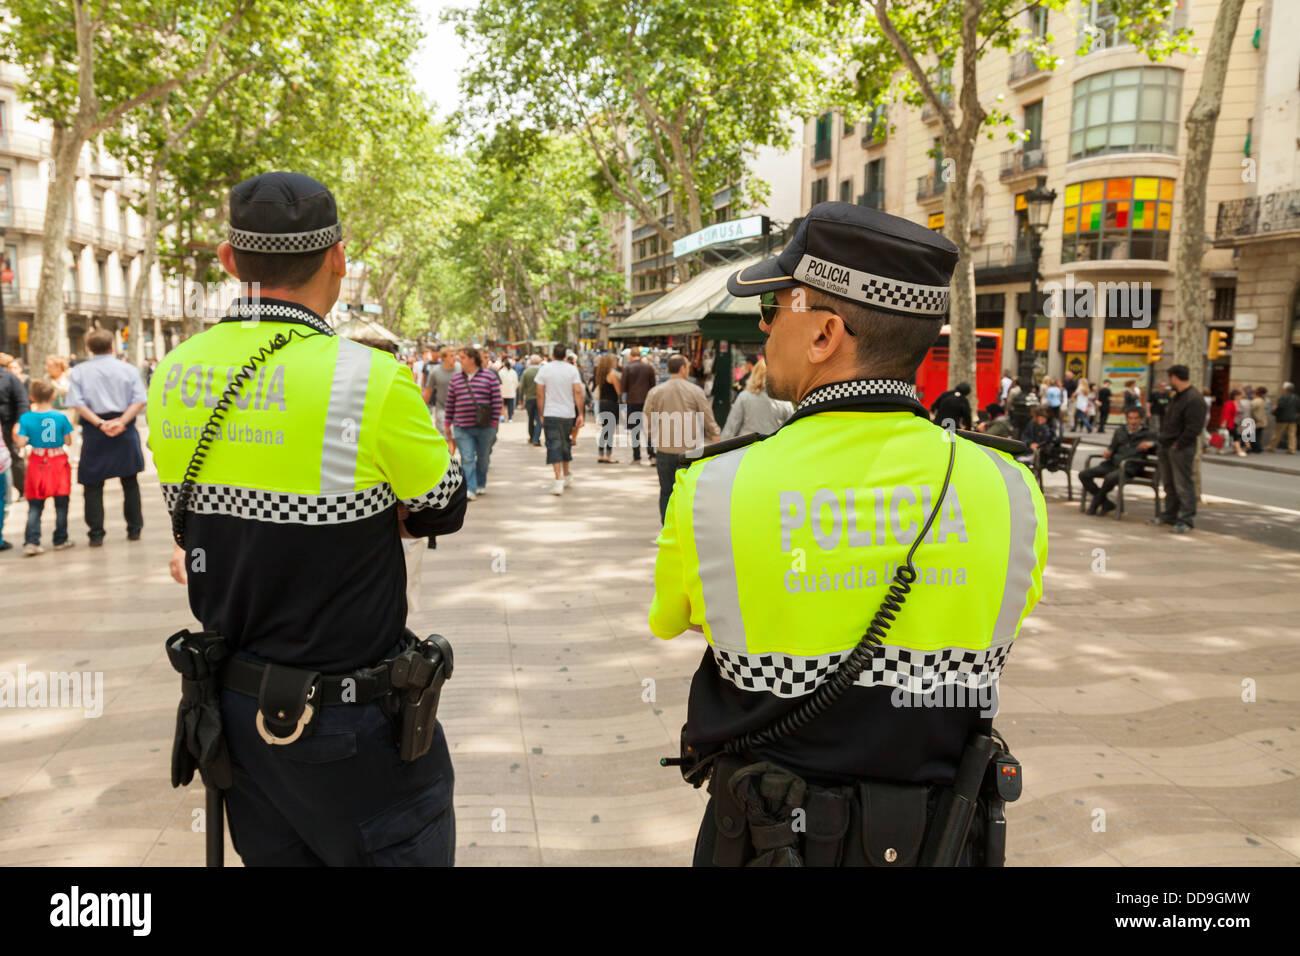 Two Guardia Urbana Policemen policing the La Rambla, Barcelona. - Stock Image